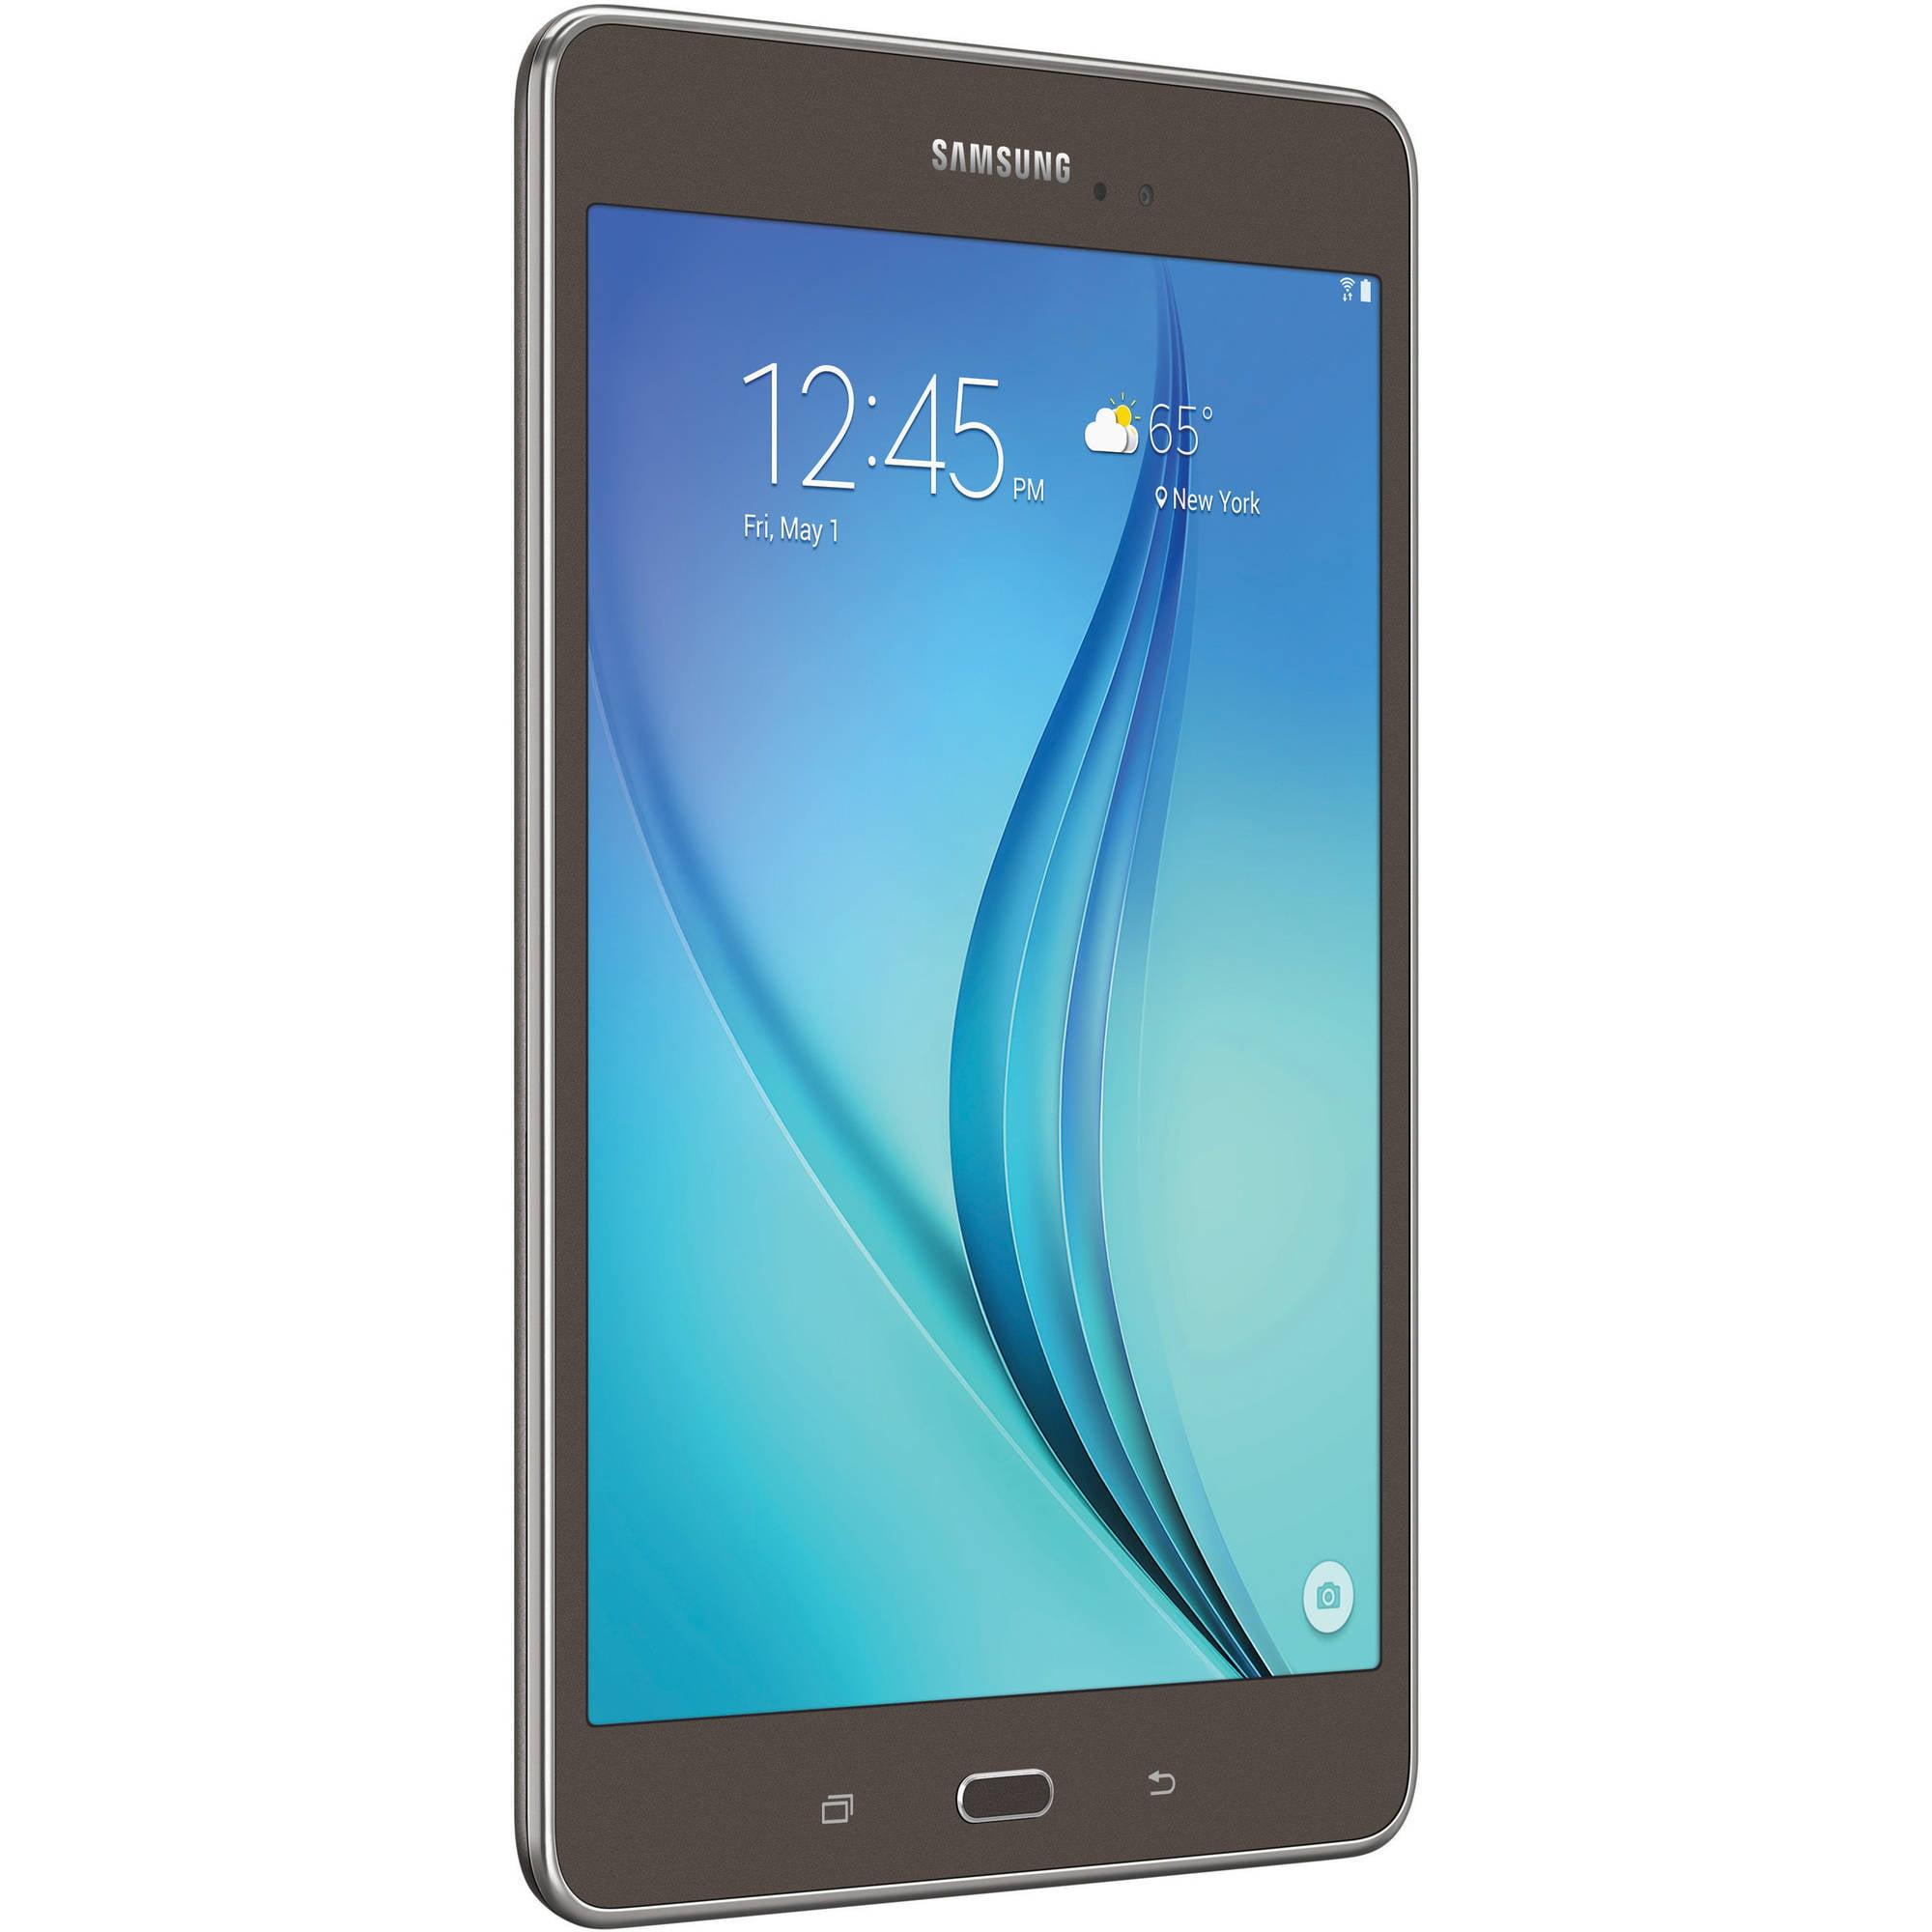 Samsung Galaxy Tab A 8 Tablet 16gb Smoky Titanium Refurbished Asoftcase S8 Plus